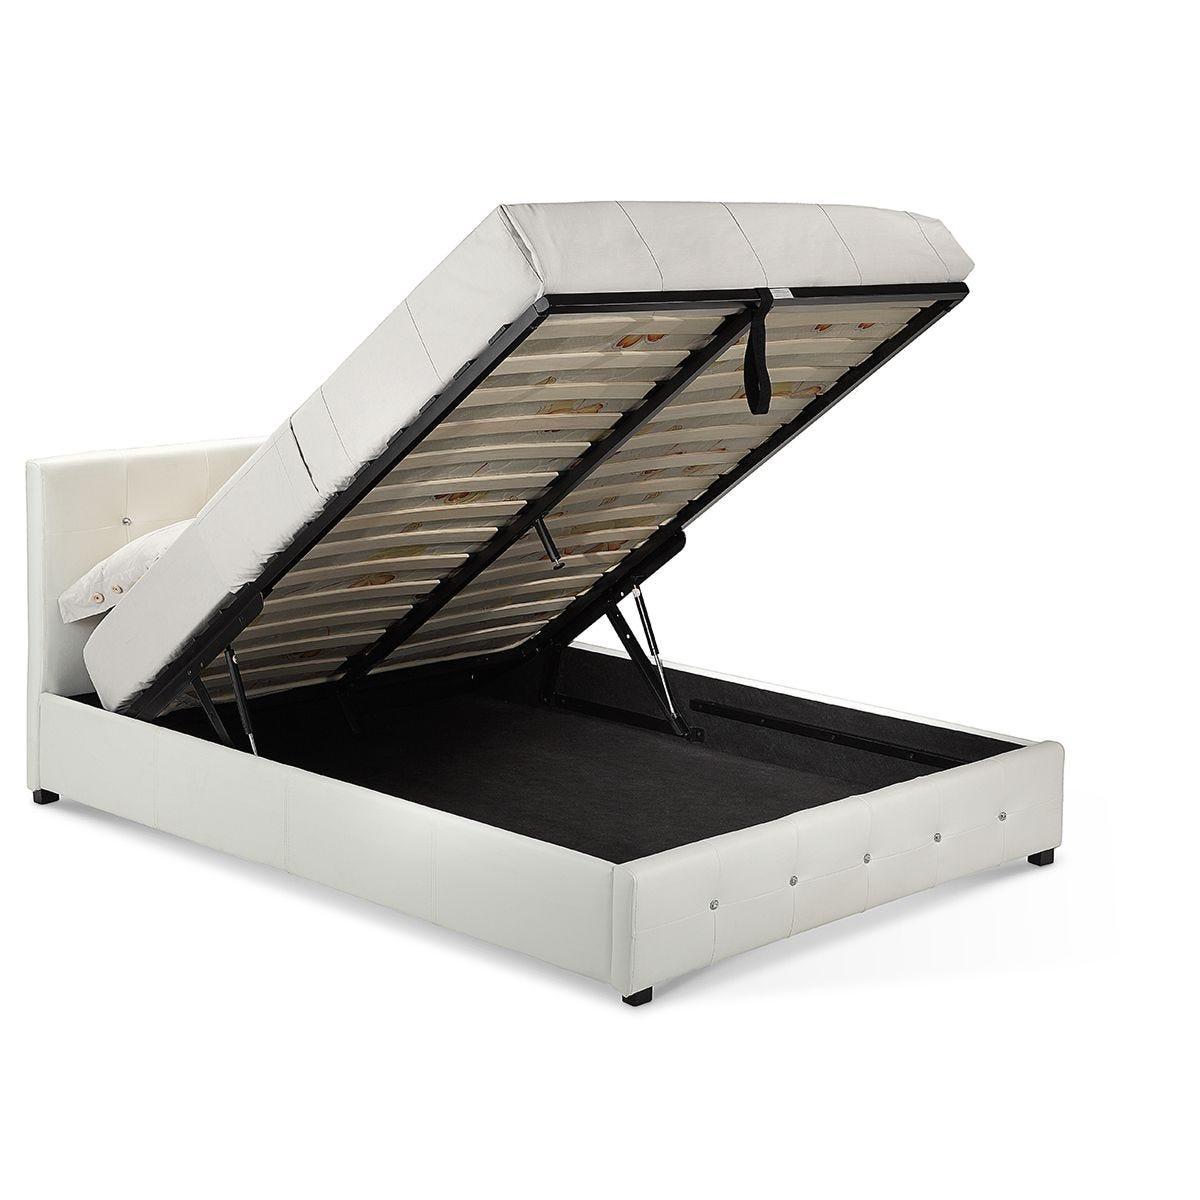 Quartz Storage PU Faux Leather Double Bed White